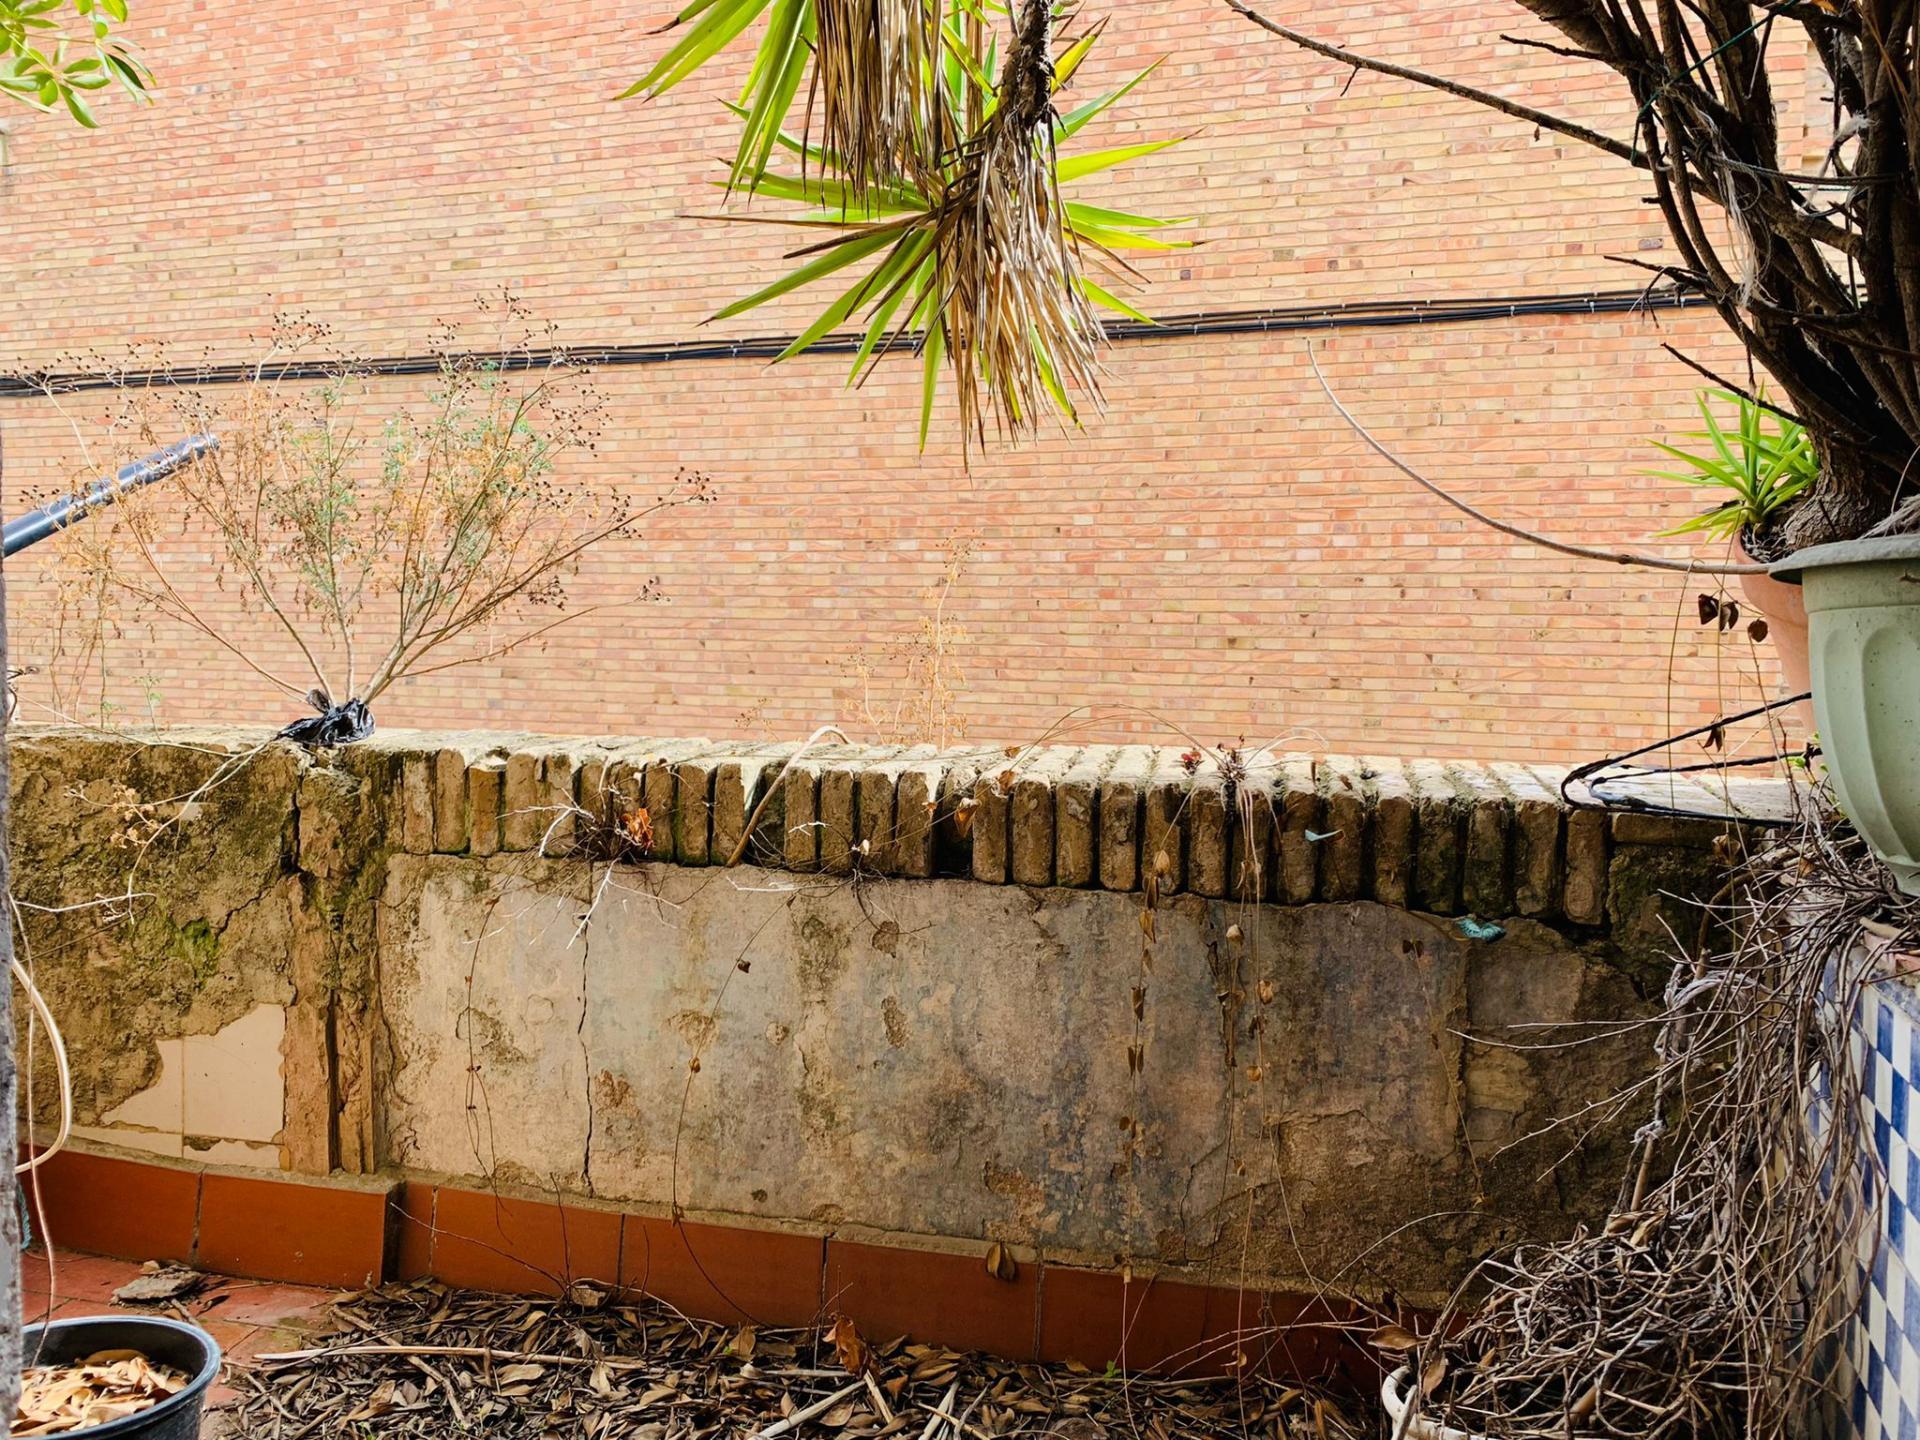 Foto 10 (V-750-2021) - Inmueble en  Venda a Sant Pere de Riudebitlles